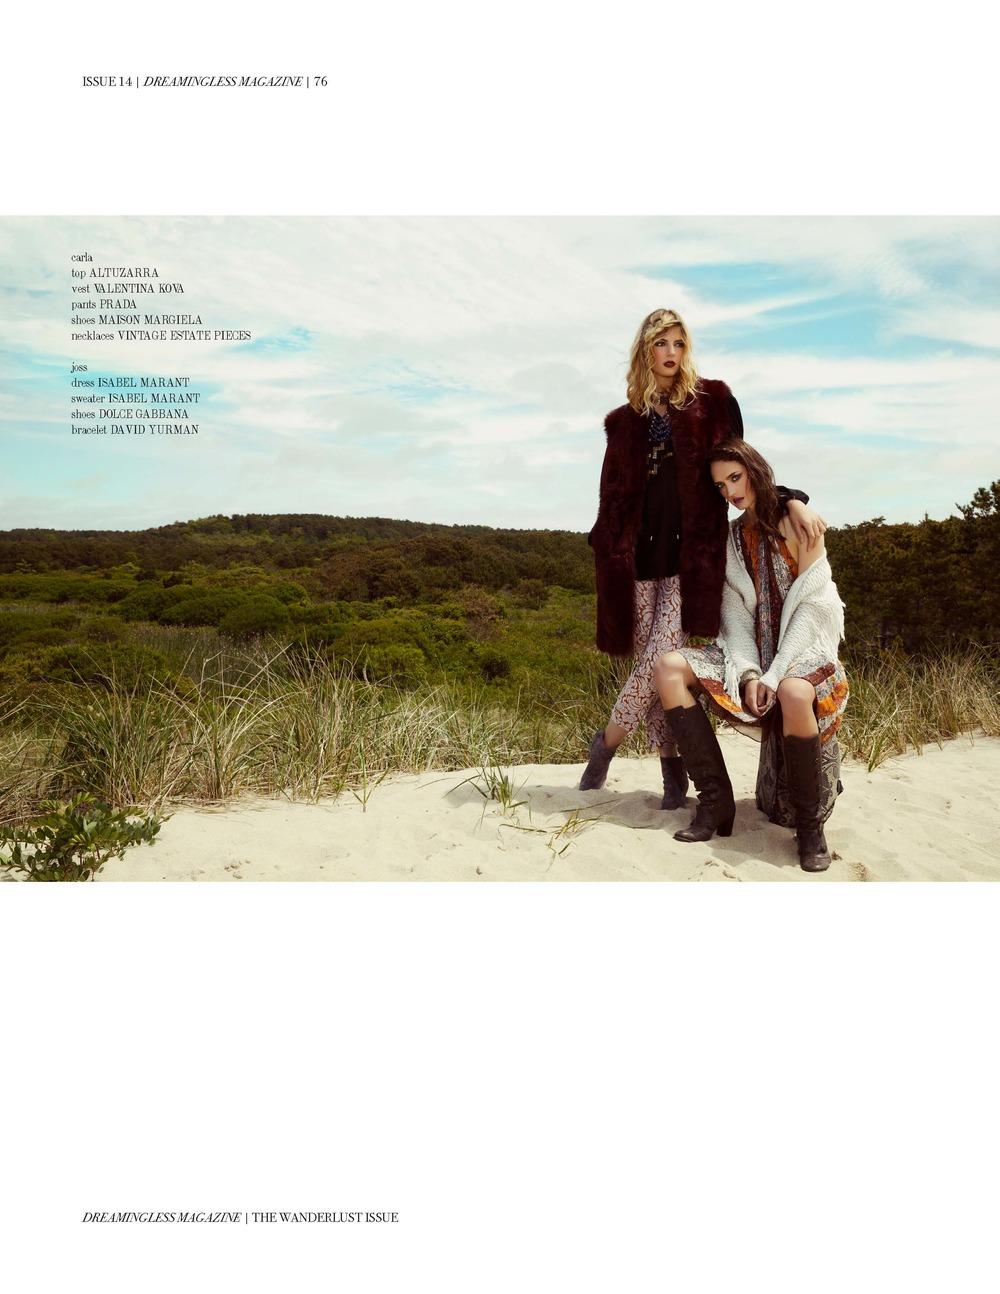 Dreamingless Magazine - The  Wanderlust Issue - Part Three_Page_76.jpg